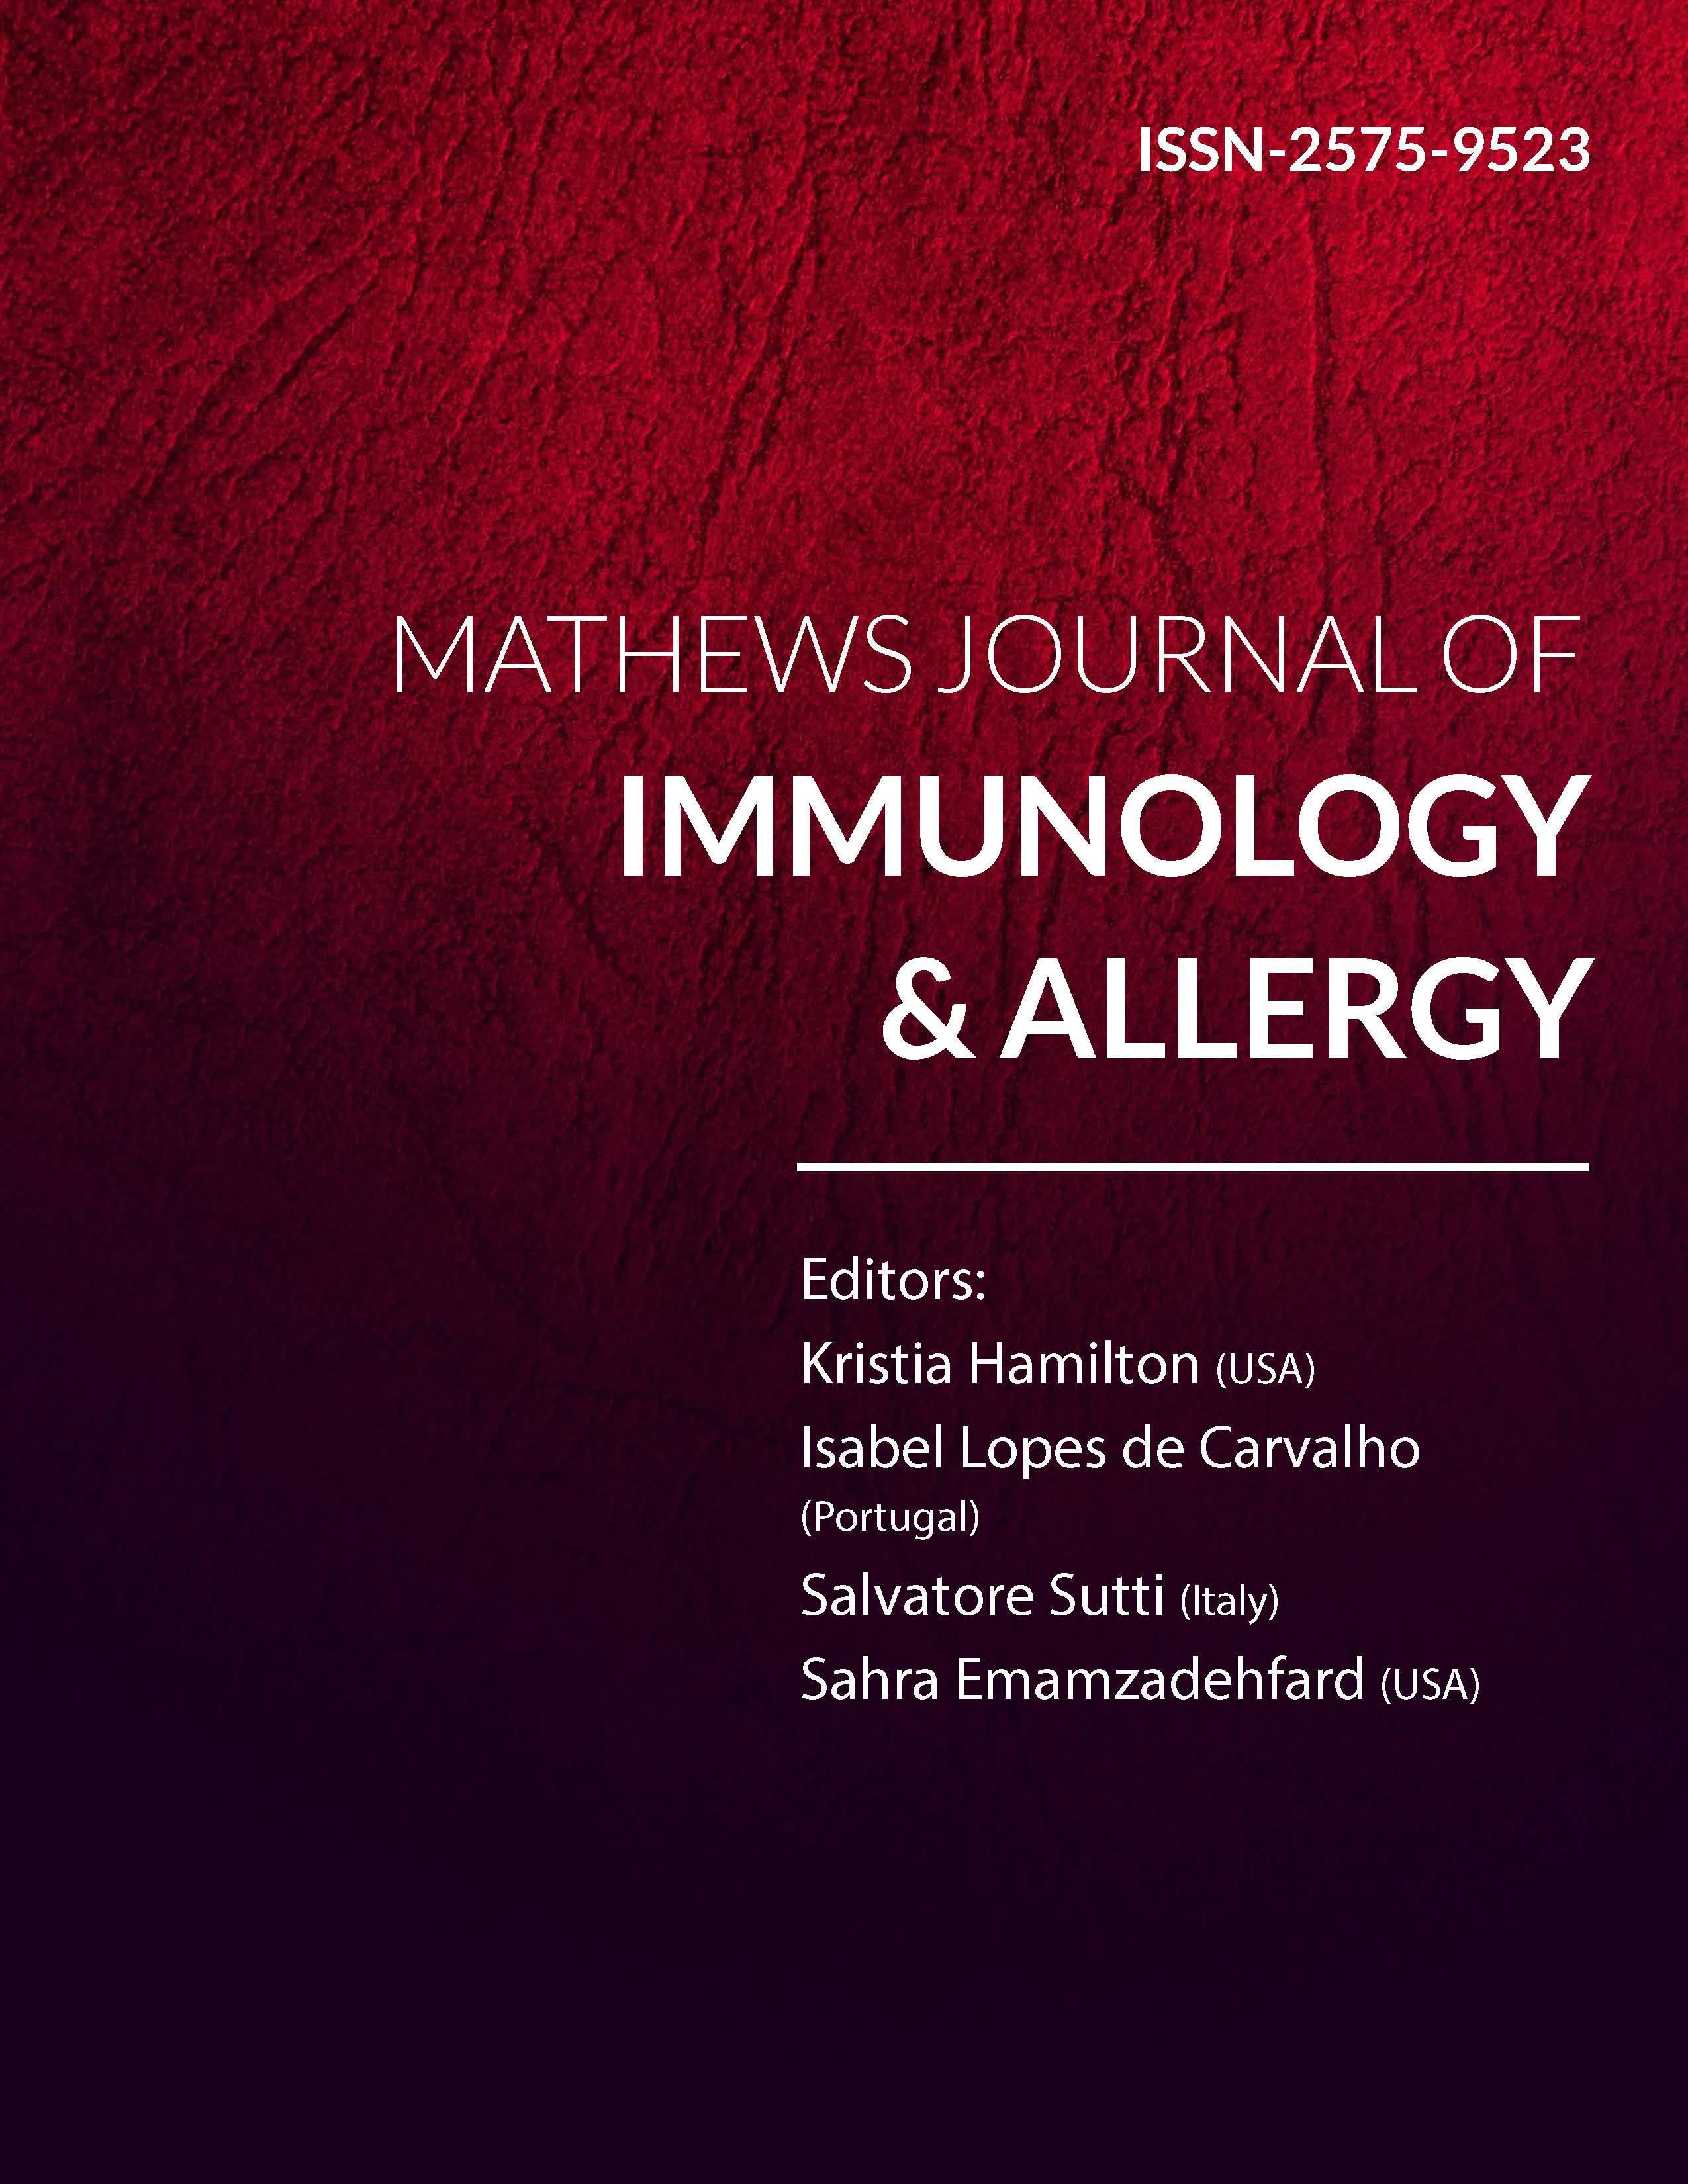 Mathews Journal of Immunology & Allergy